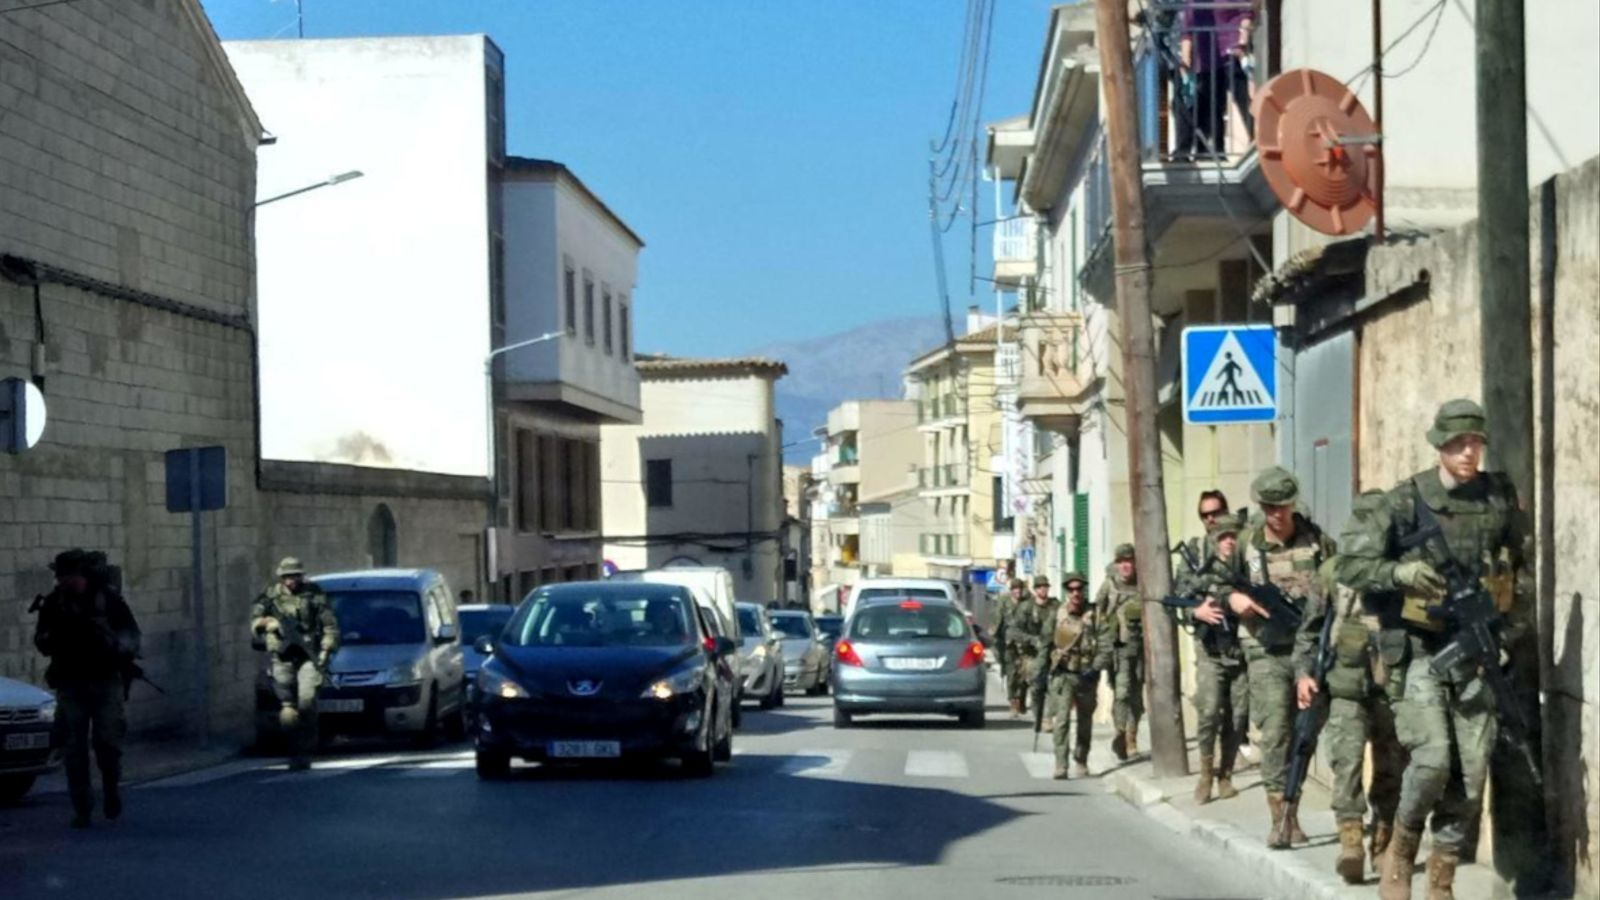 Soldats espanyols fan maniobres pel mig de Muro, Santa Margalida i sa Pobla